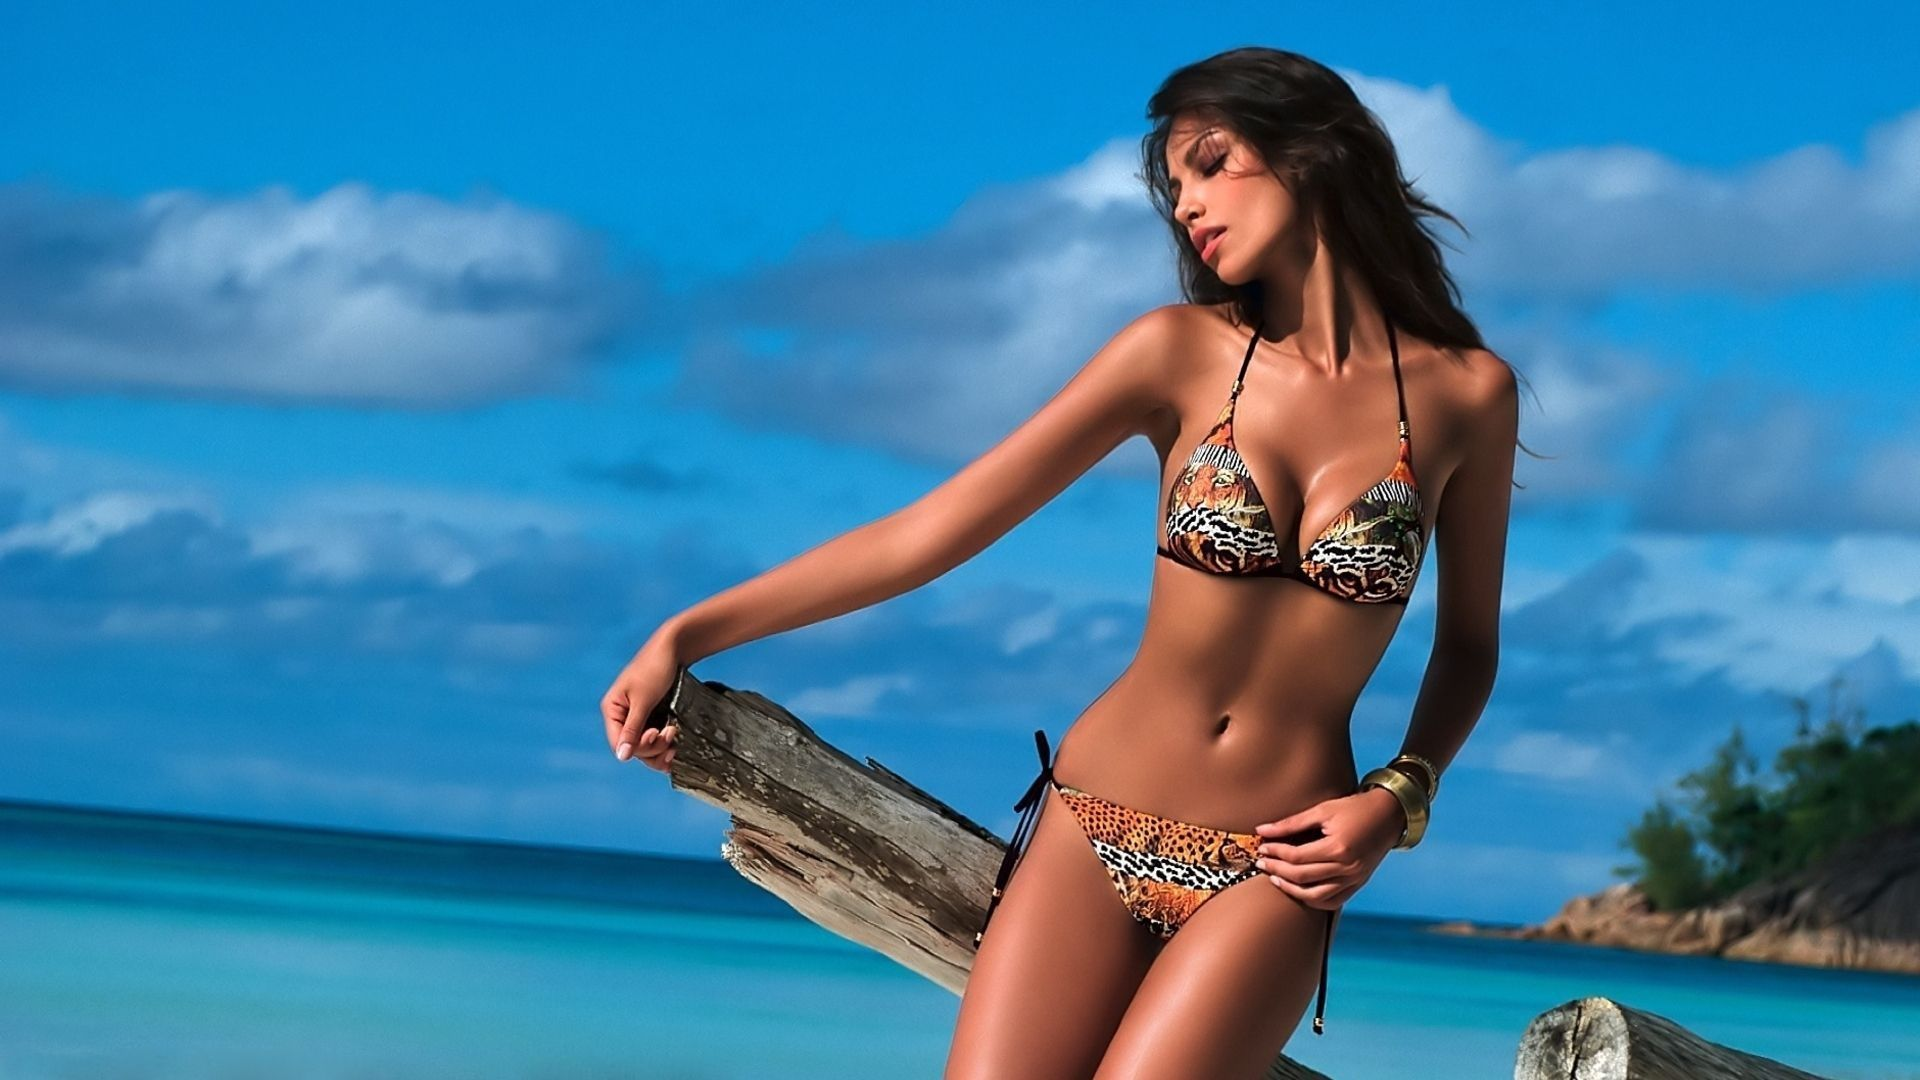 pinmarius re on madalina diana ghenea | pinterest | beach